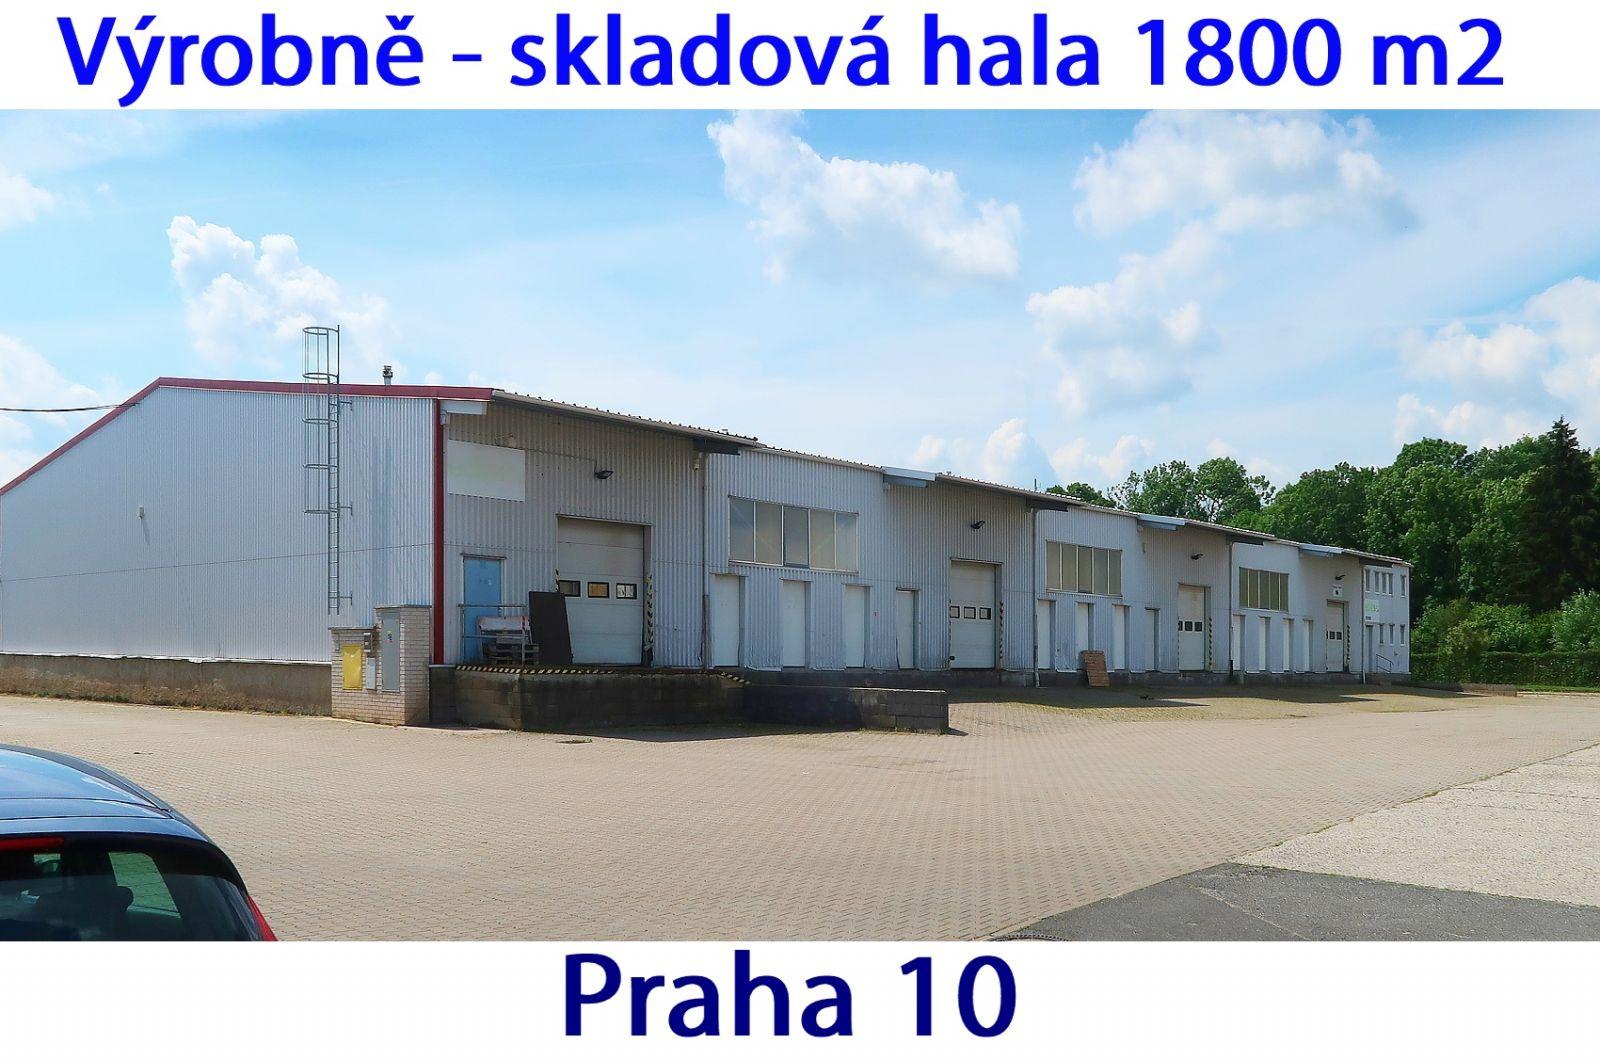 Hala 1800 m2 ( 2080 m2 celkem ), rampy TIR, zázemí, Praha 10